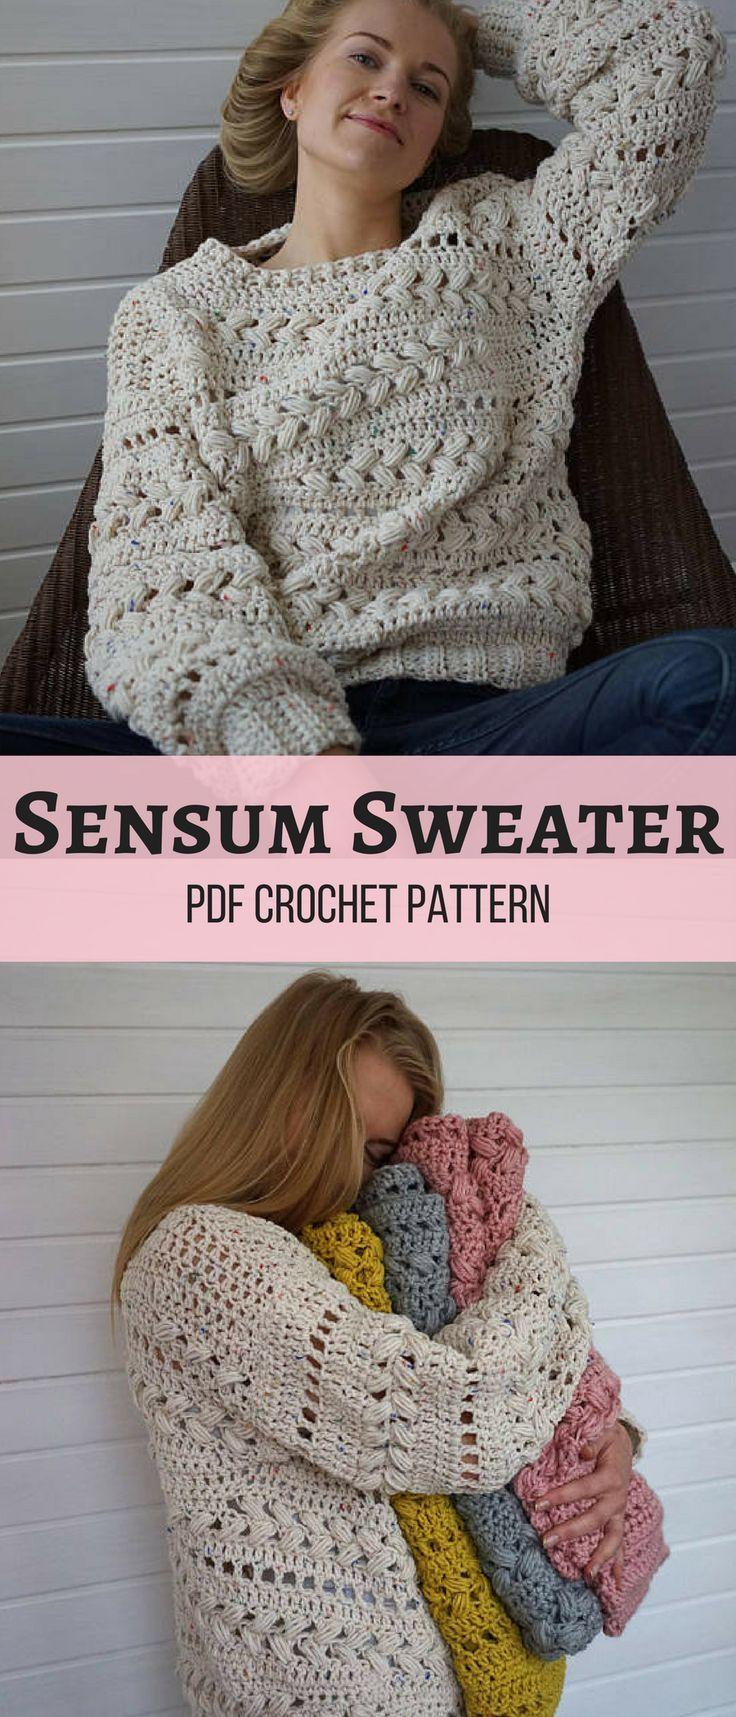 Make your own cozy Crochet Sensum Sweater! Love the beautiful puff stitch braids. #crochetsweater #ad #pattern